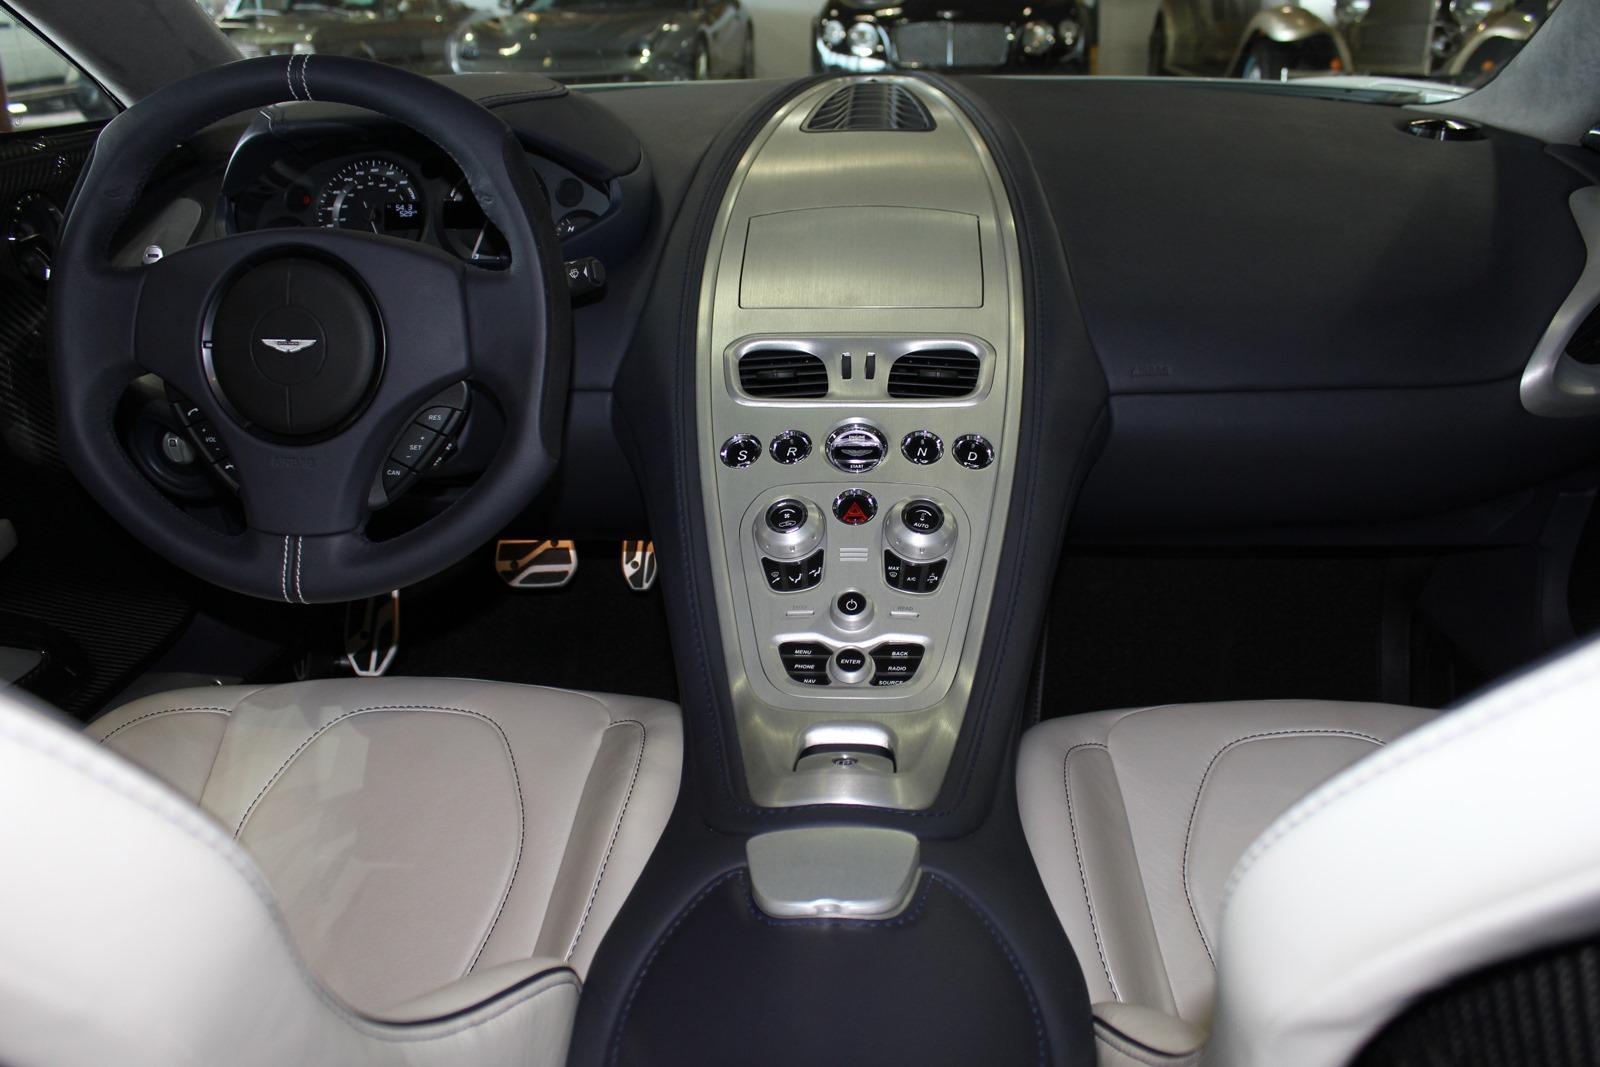 Aston-Martin-One-77-17%25255B3%25255D.jpg